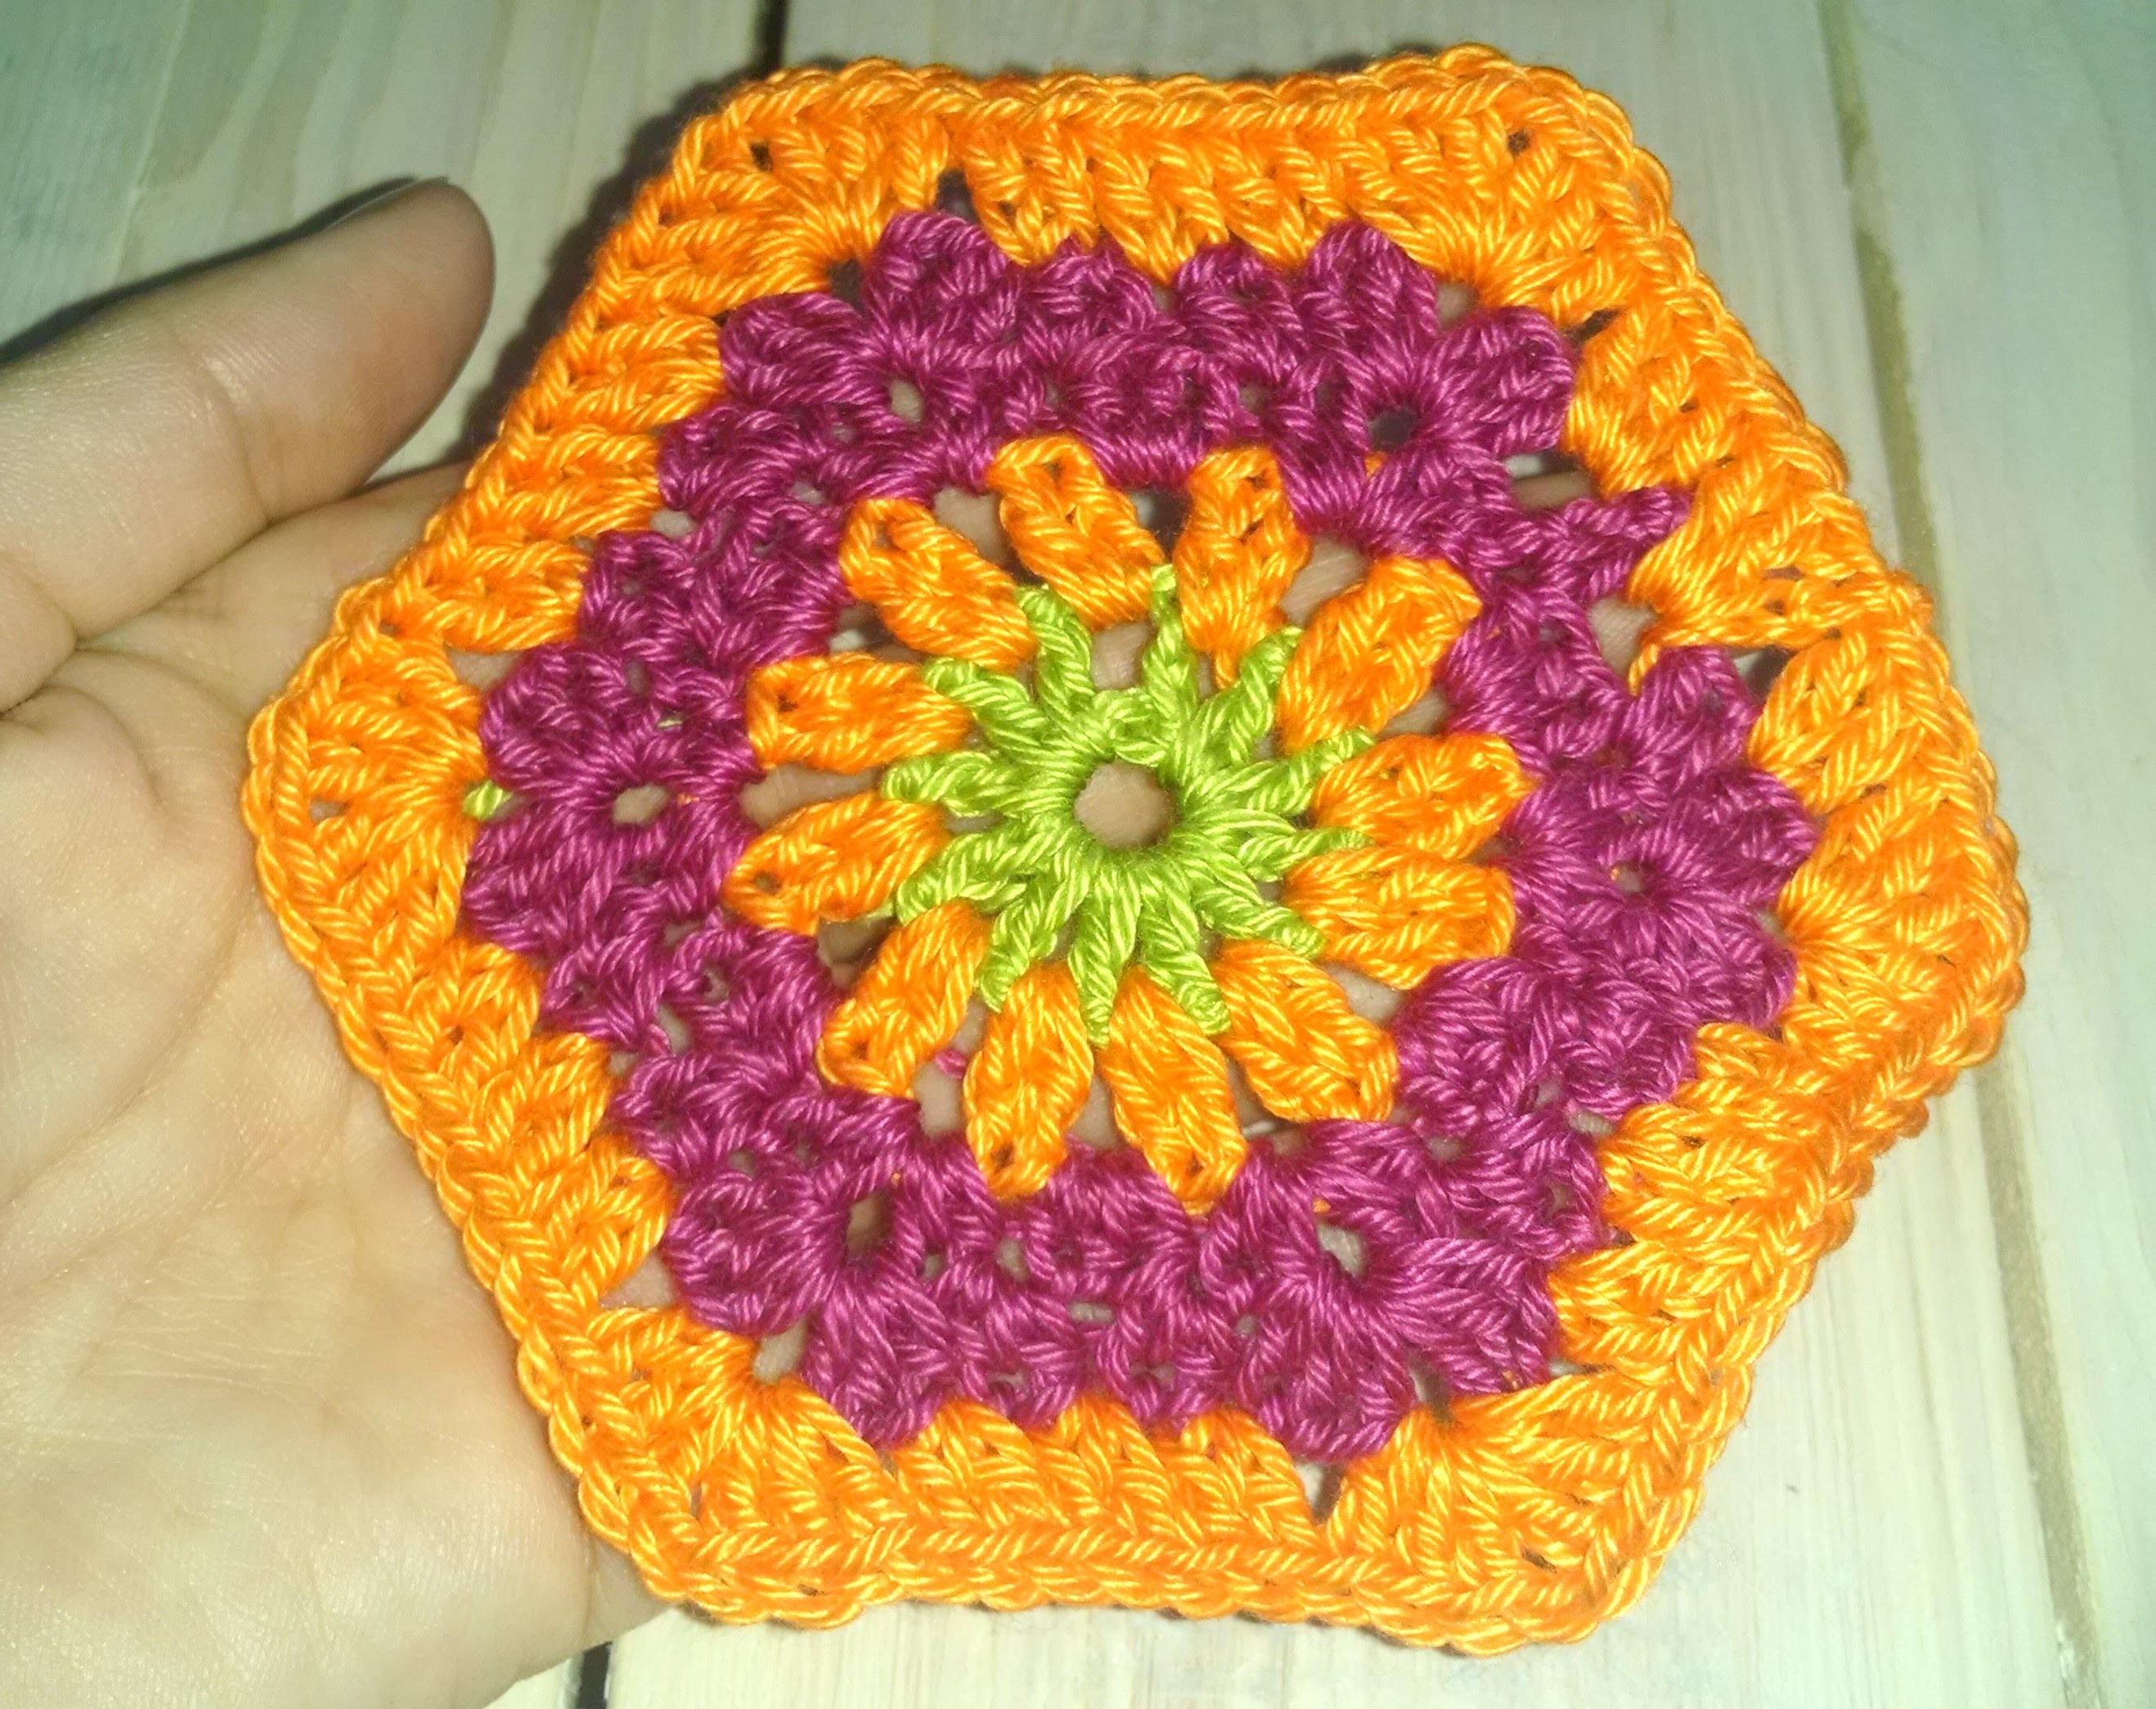 Hexagon Granny Square häkeln, sechseckig, für Anfänger